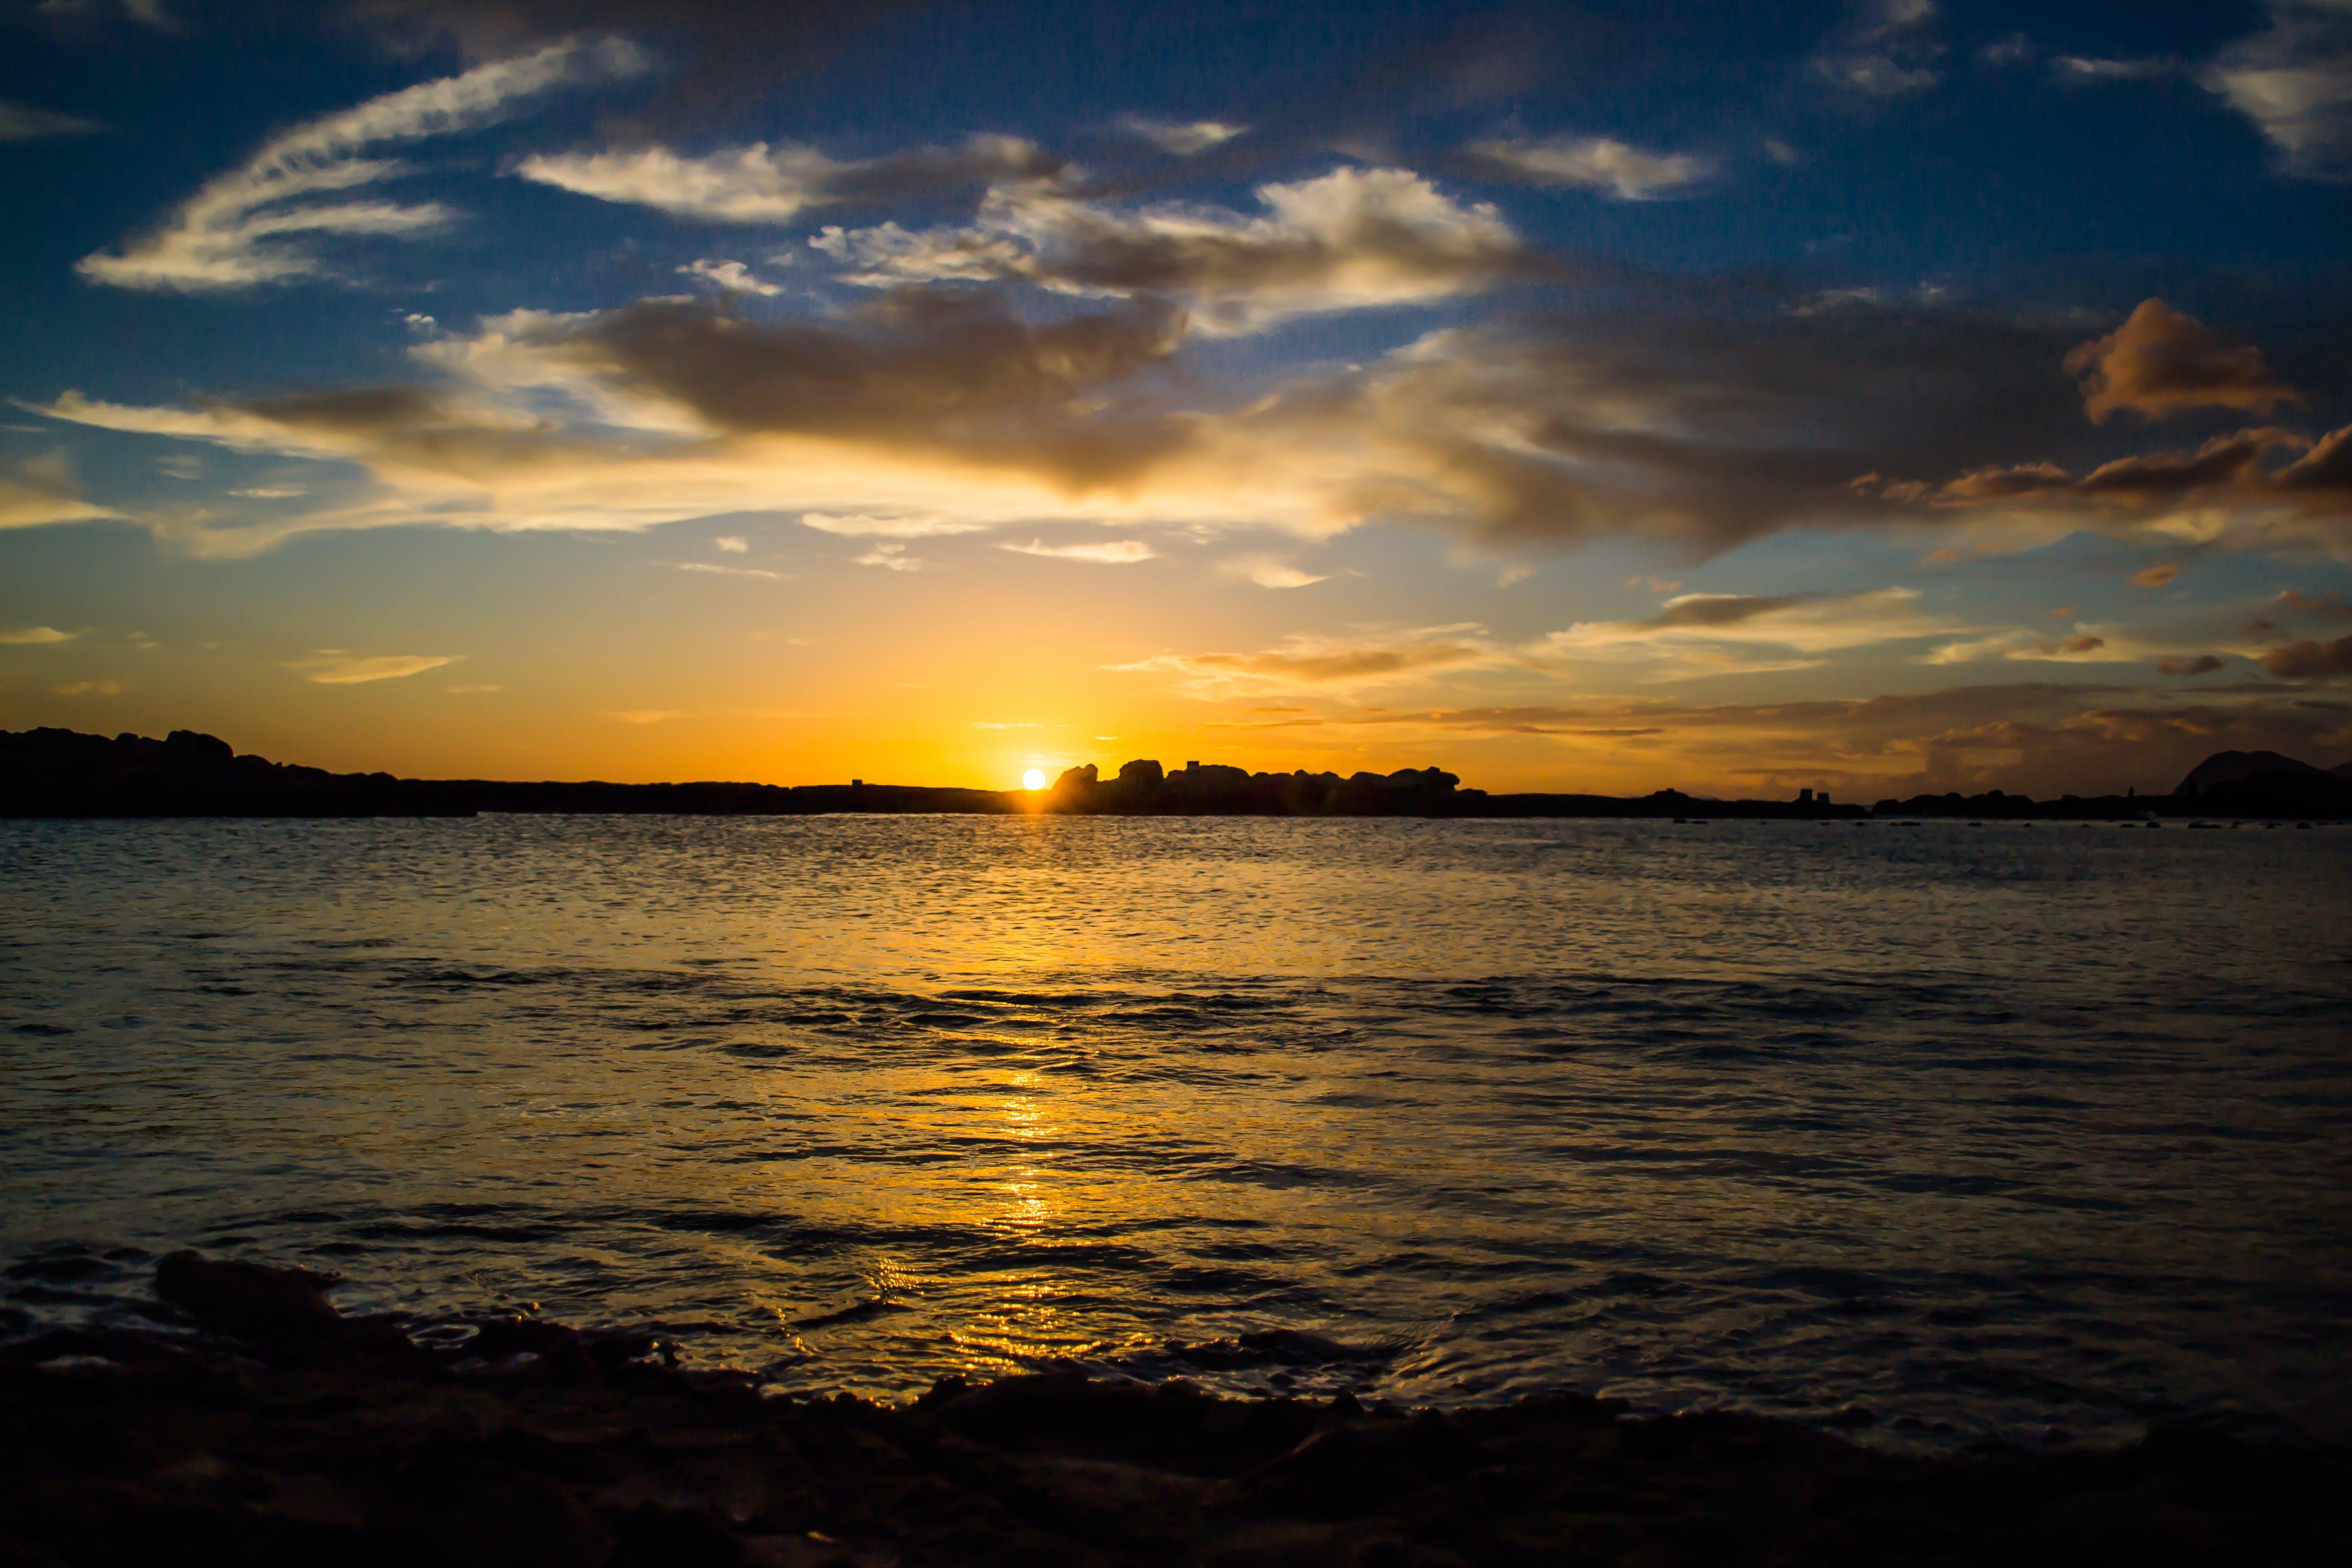 Kostenloses Stock Foto zu klischee, meer, meeresküste, ozean